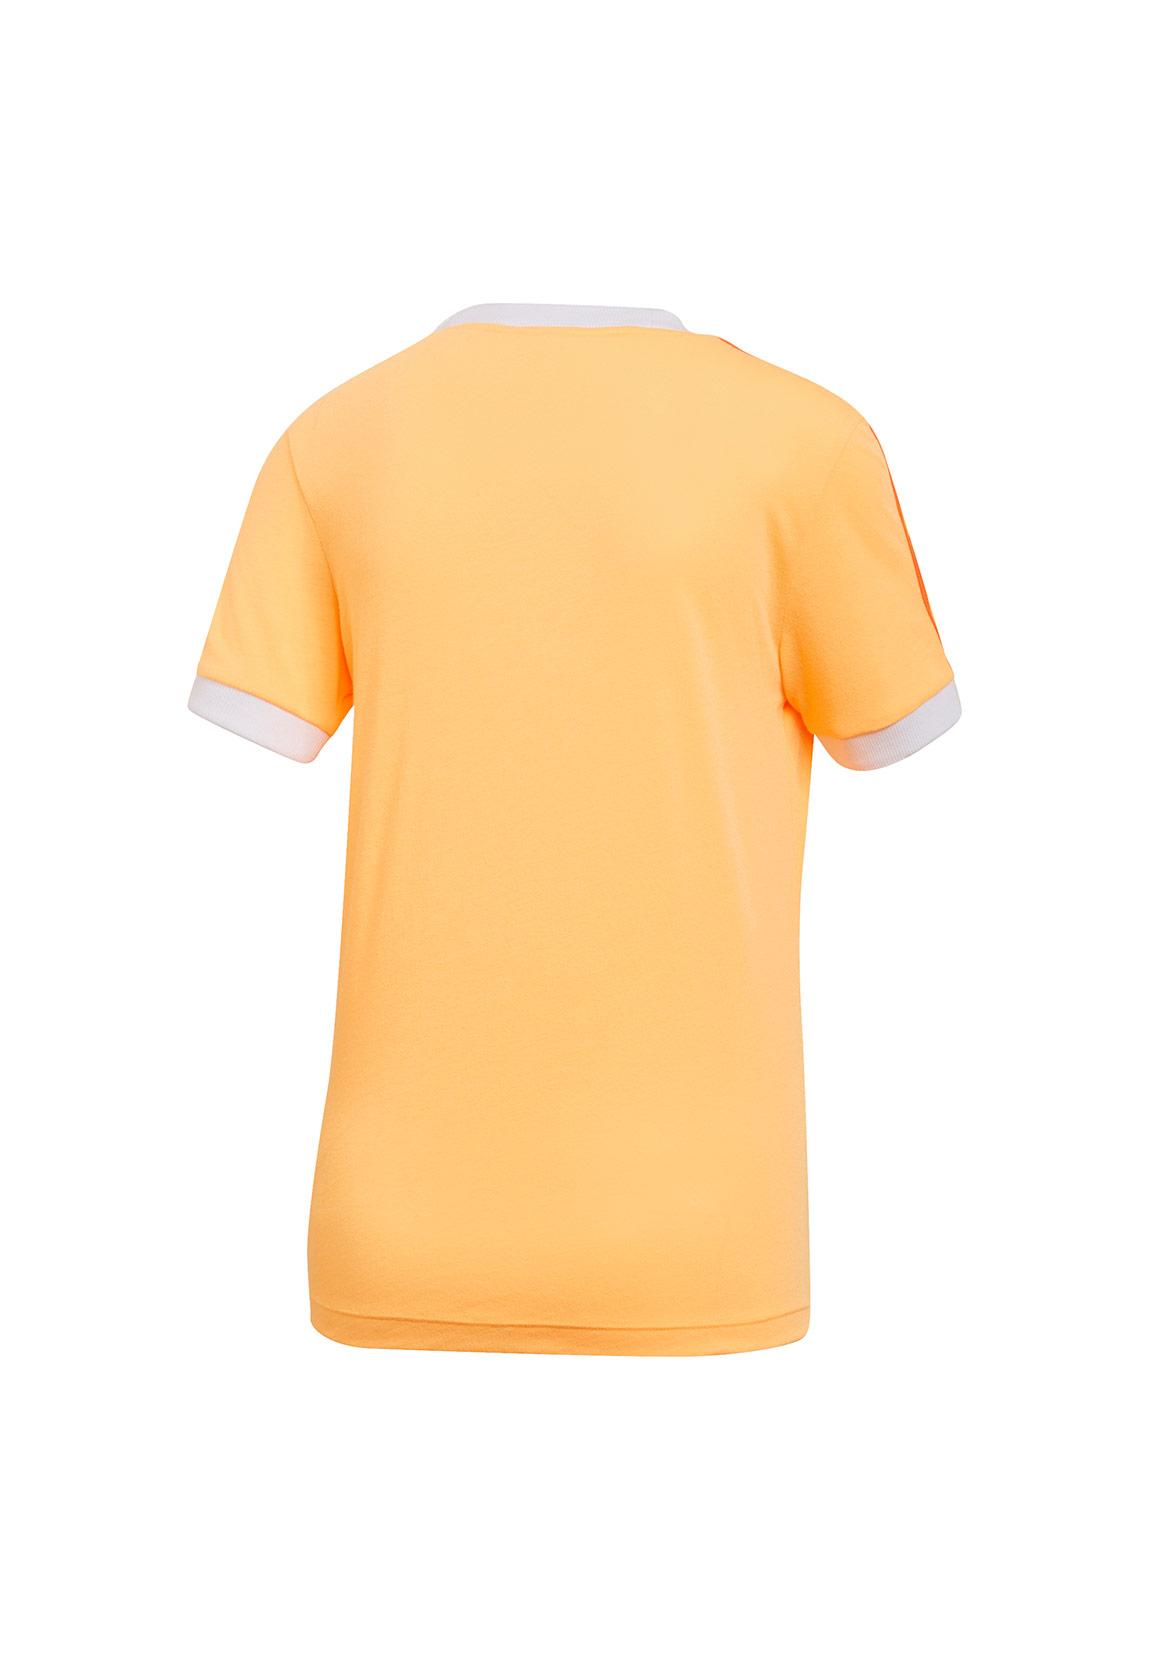 Adidas Originals T Shirt Damen 3 STR TEE ED7475 Orange